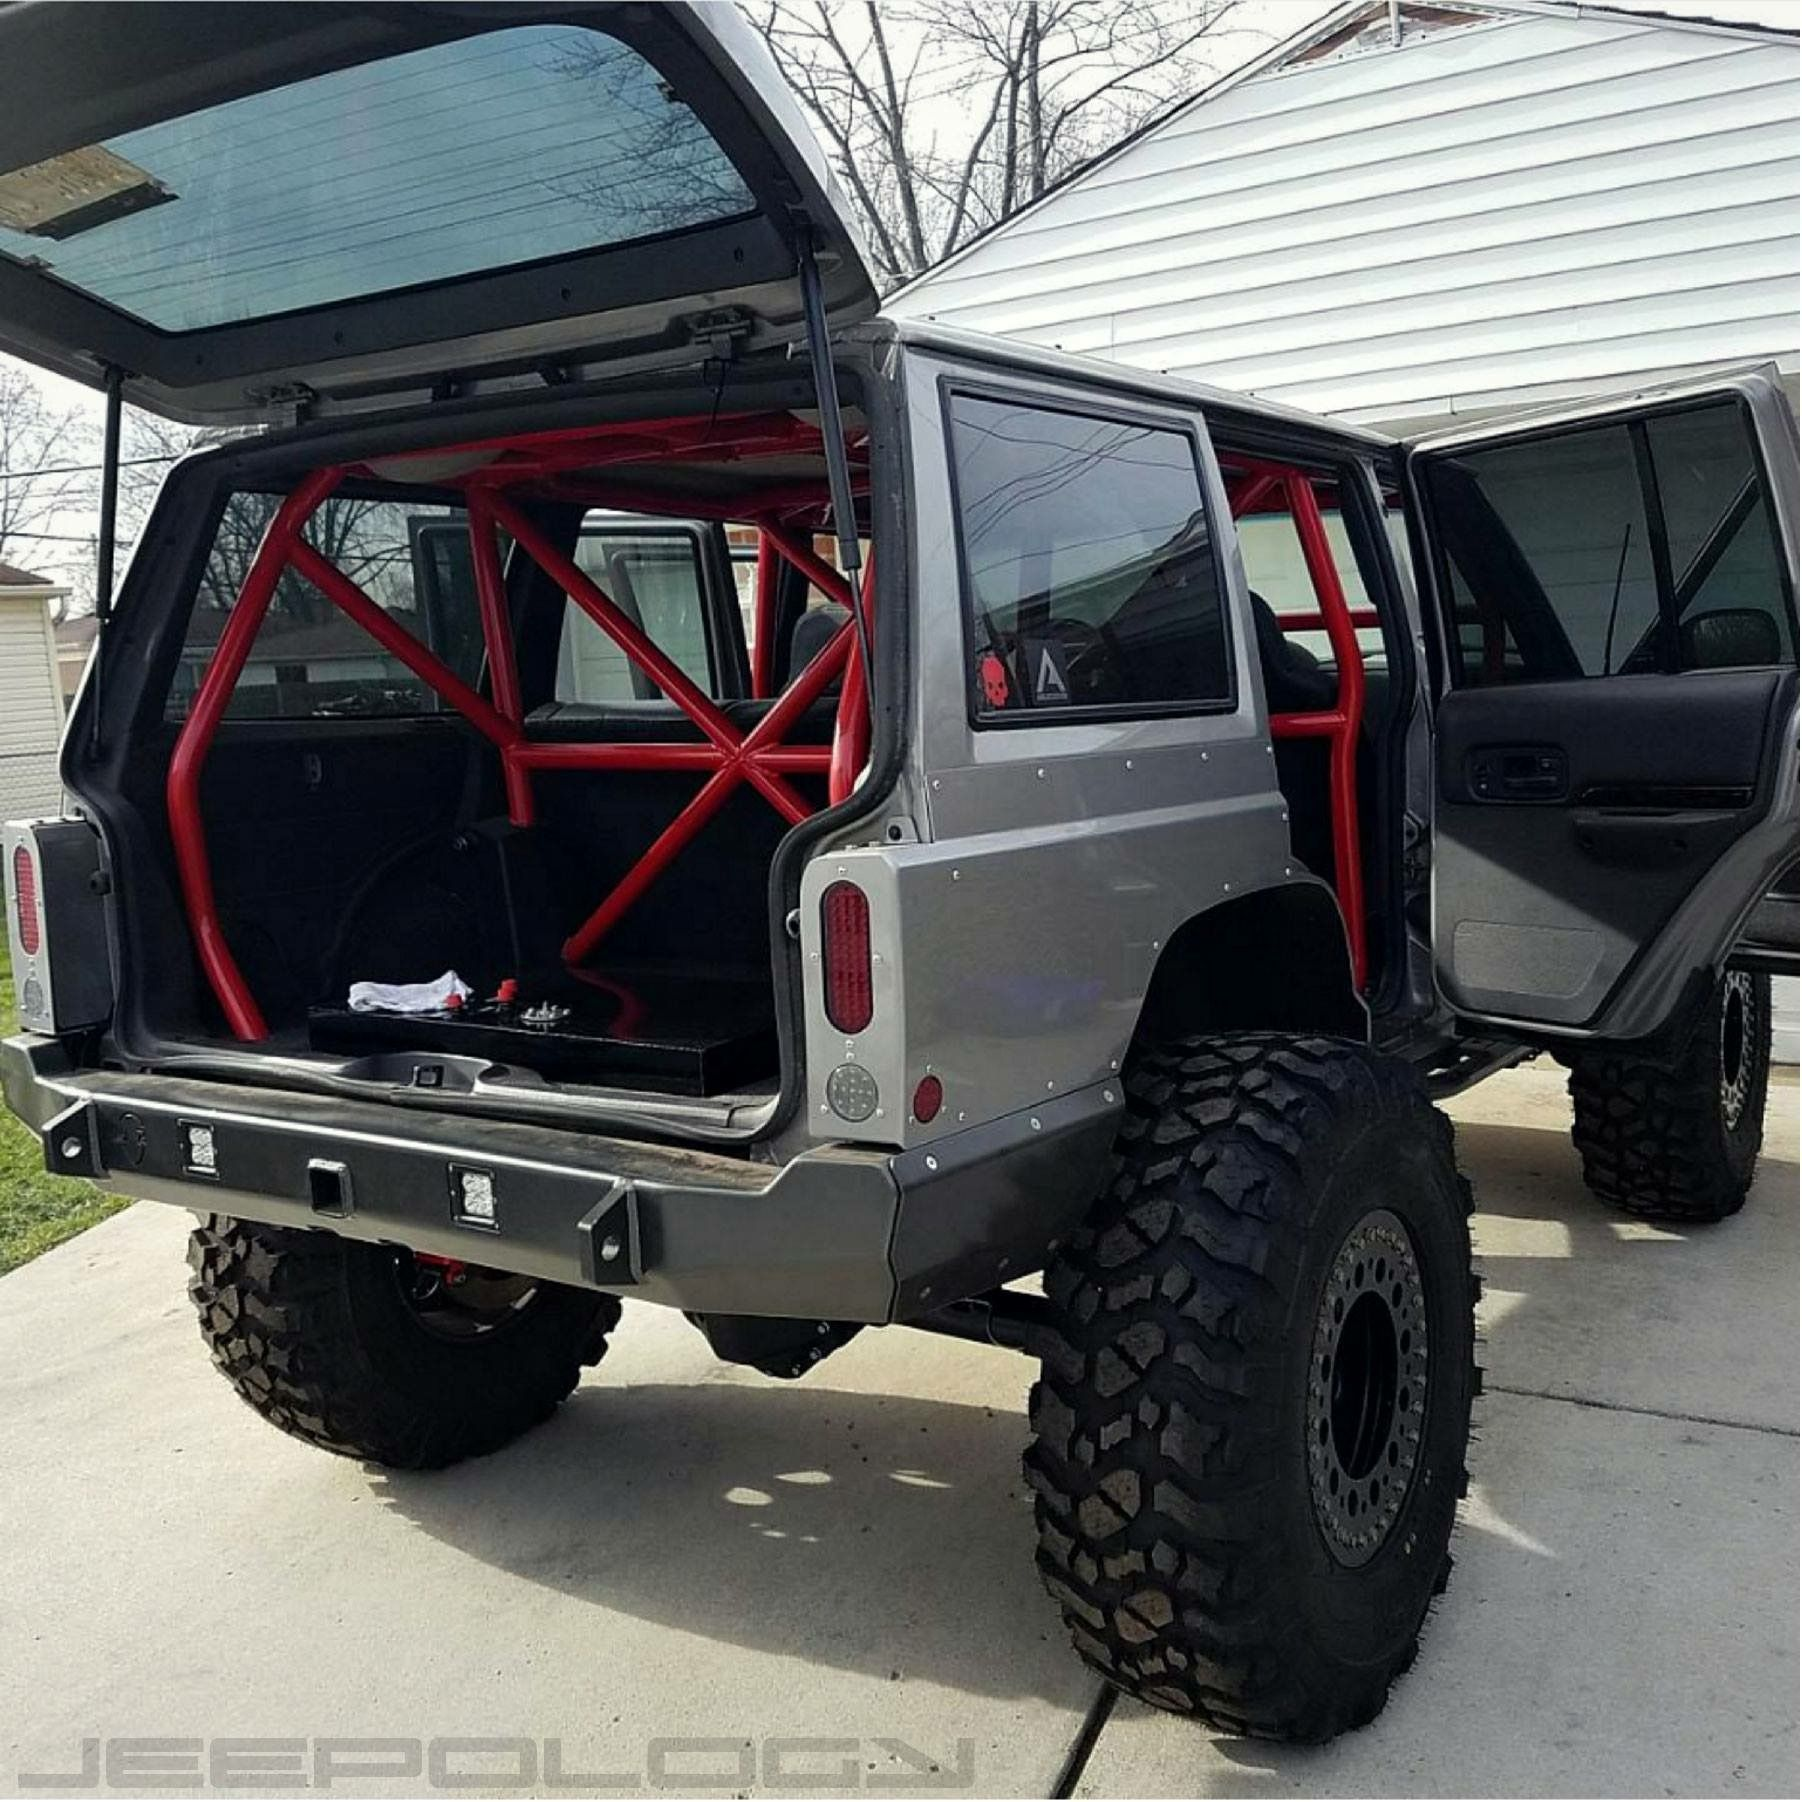 Awesome Cage Idea Jeep Cherokee Xj Jeep Xj Mods Jeep Truck